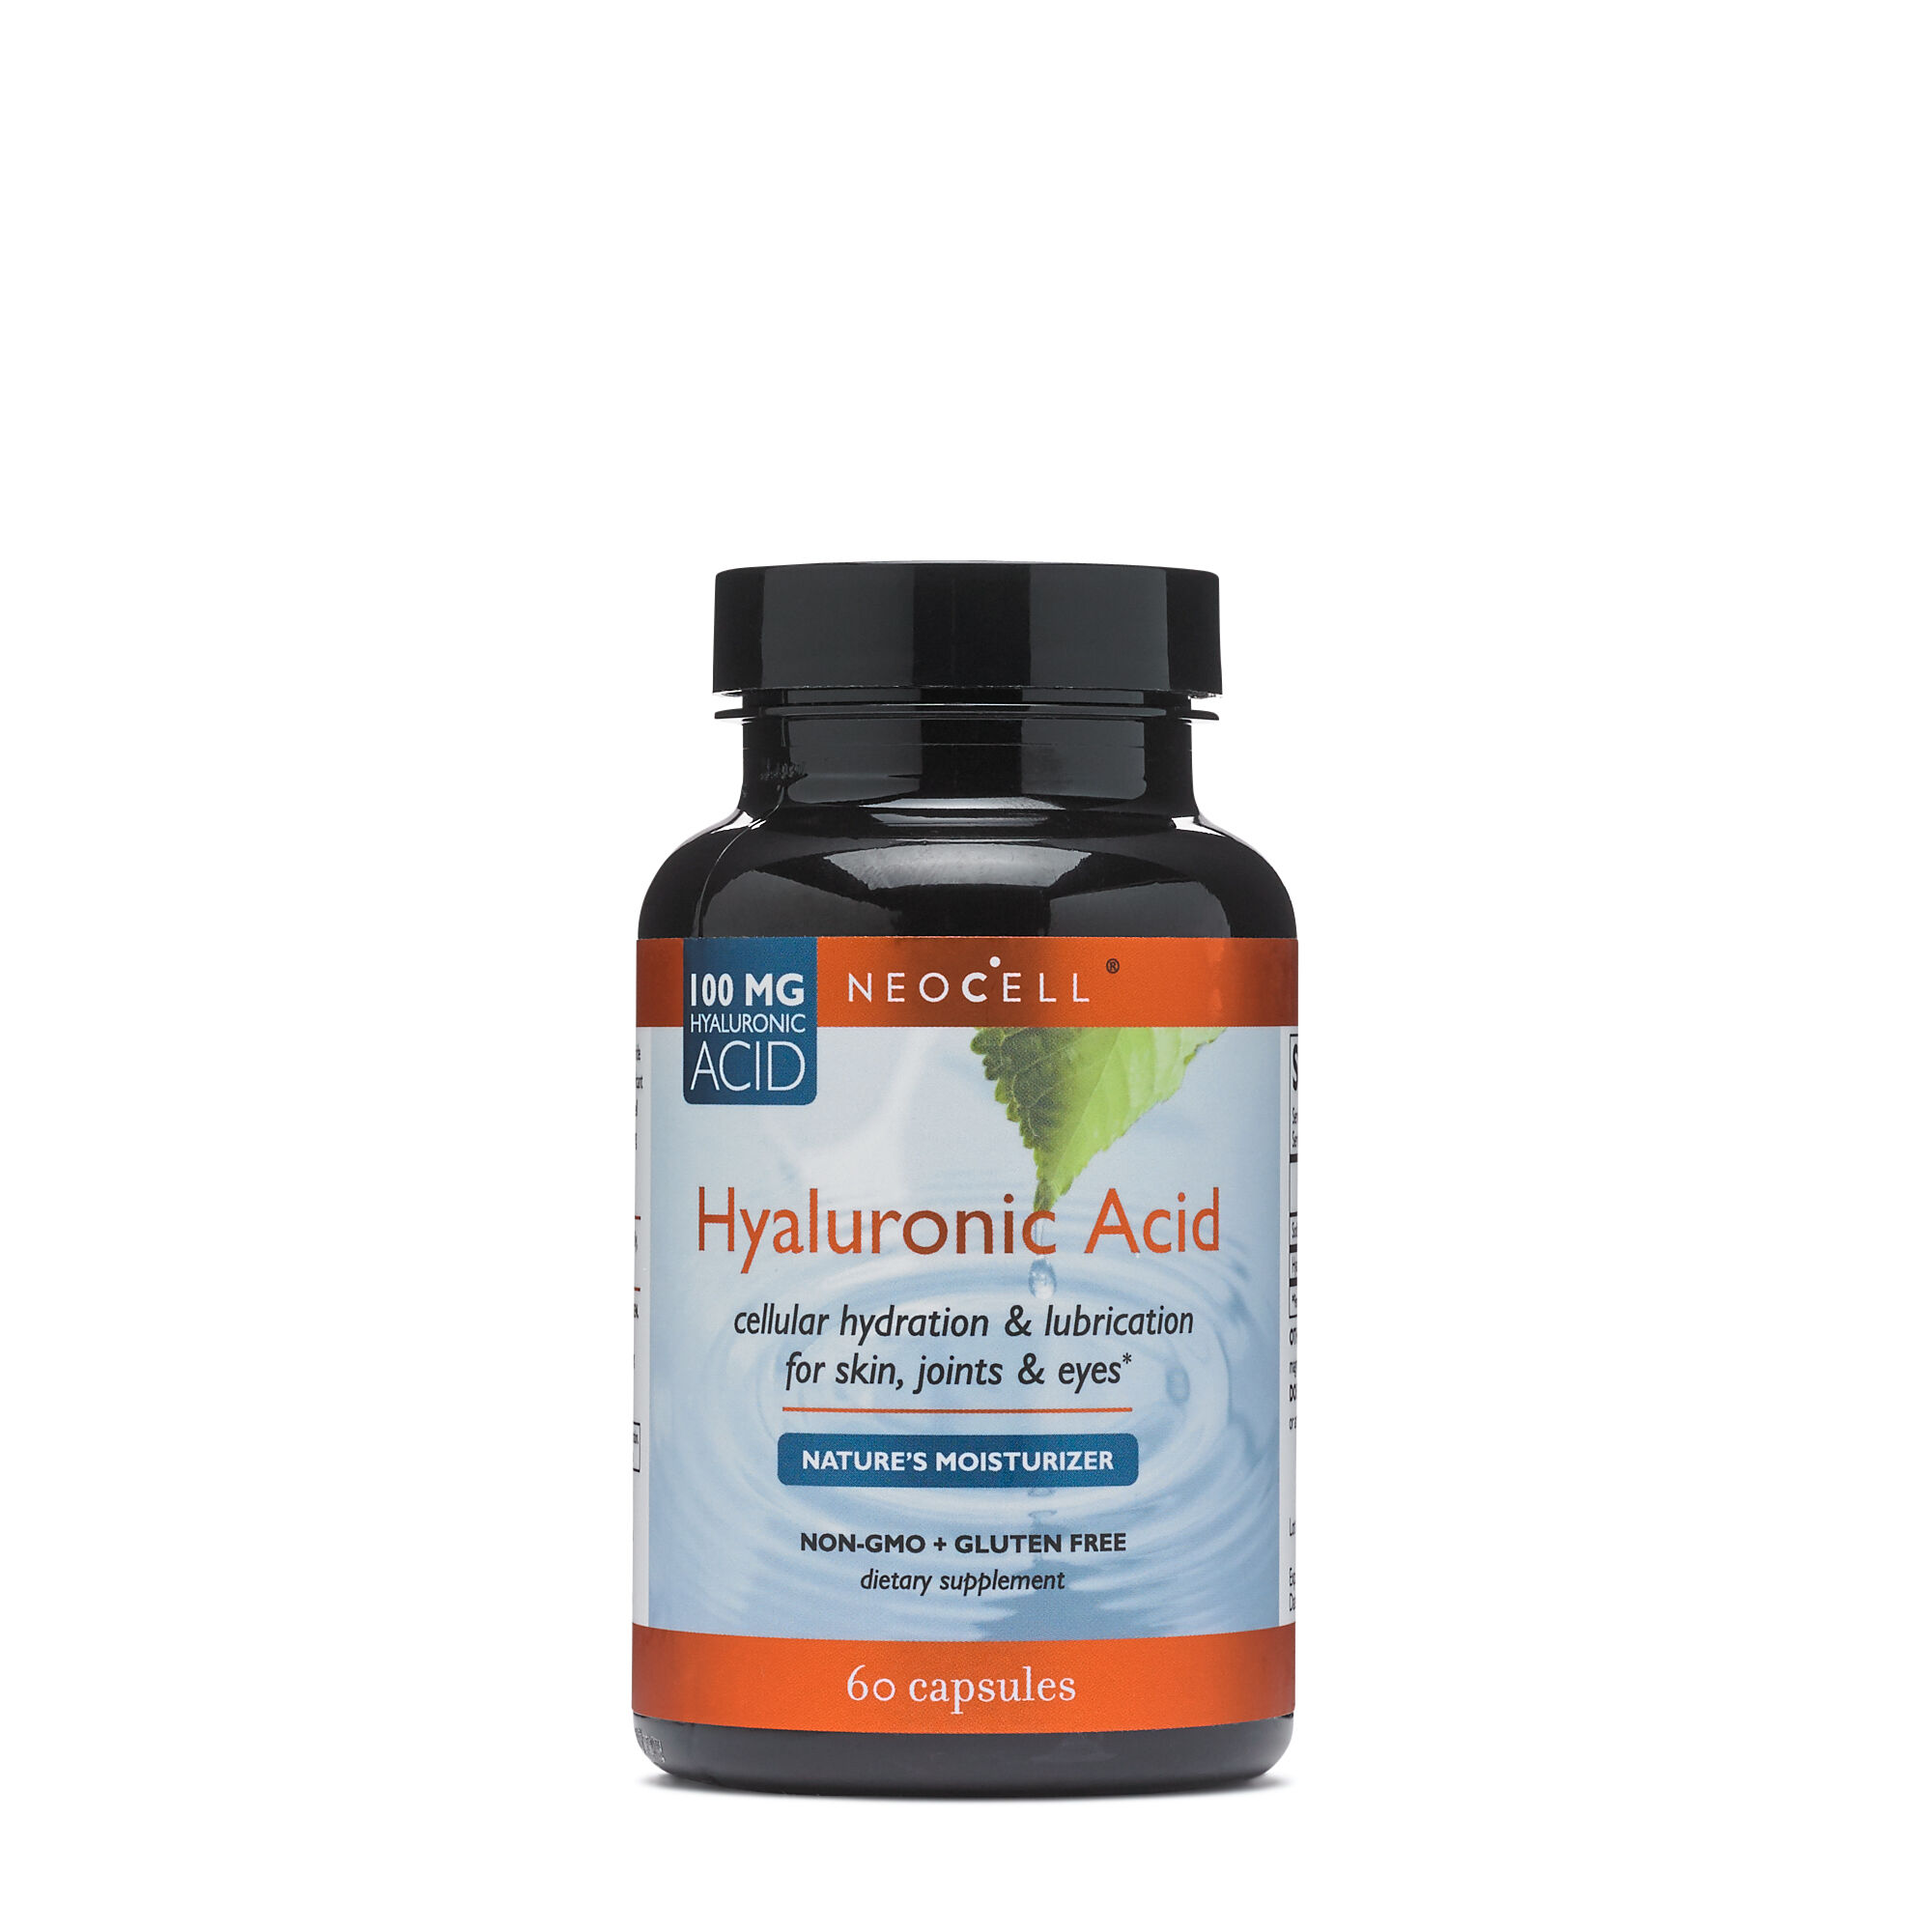 NeoCell™ Hyaluronic Acid